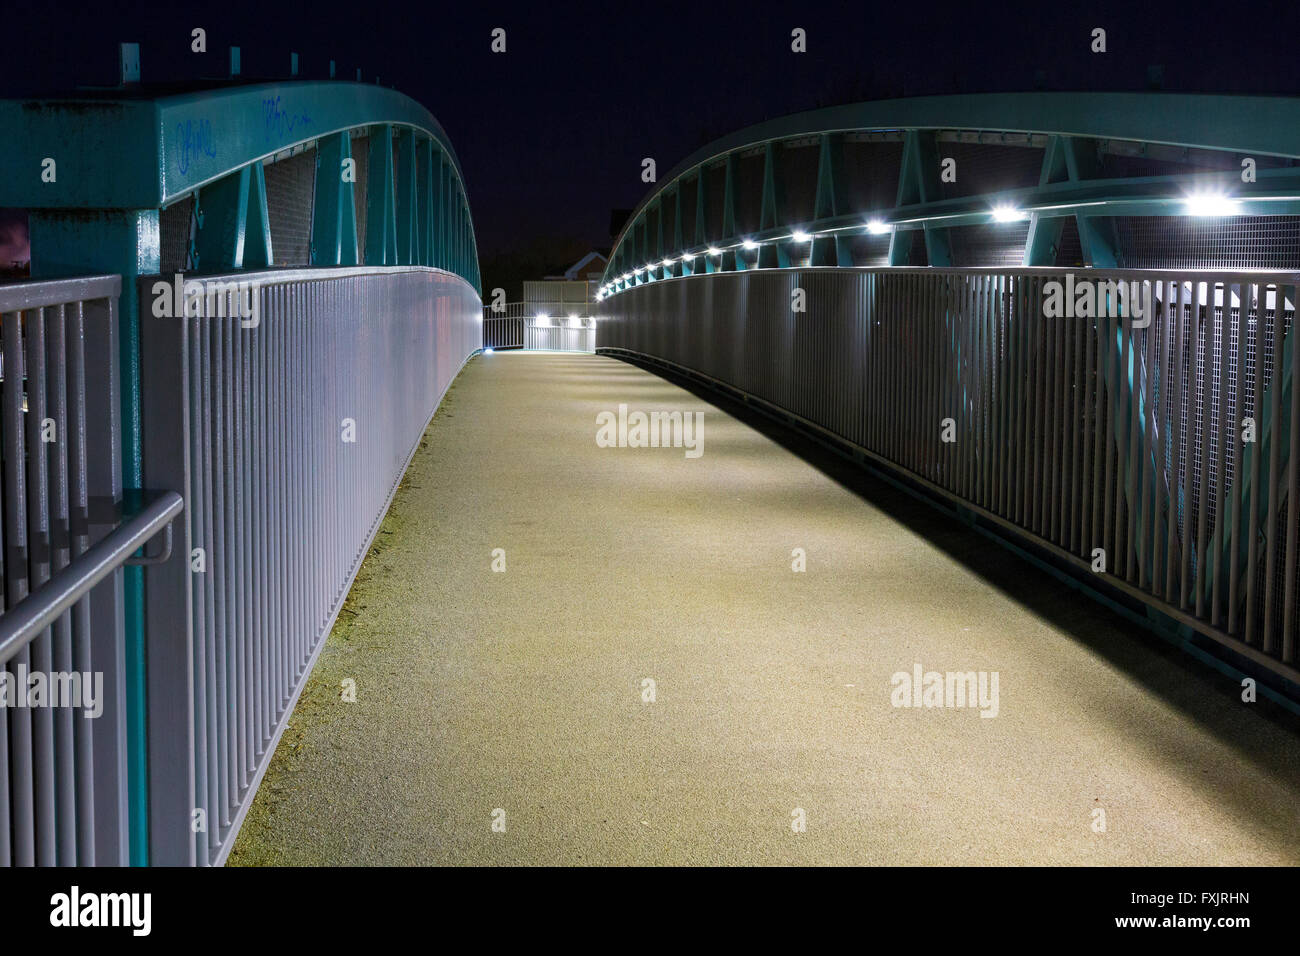 footbridge walkway at night - Stock Image